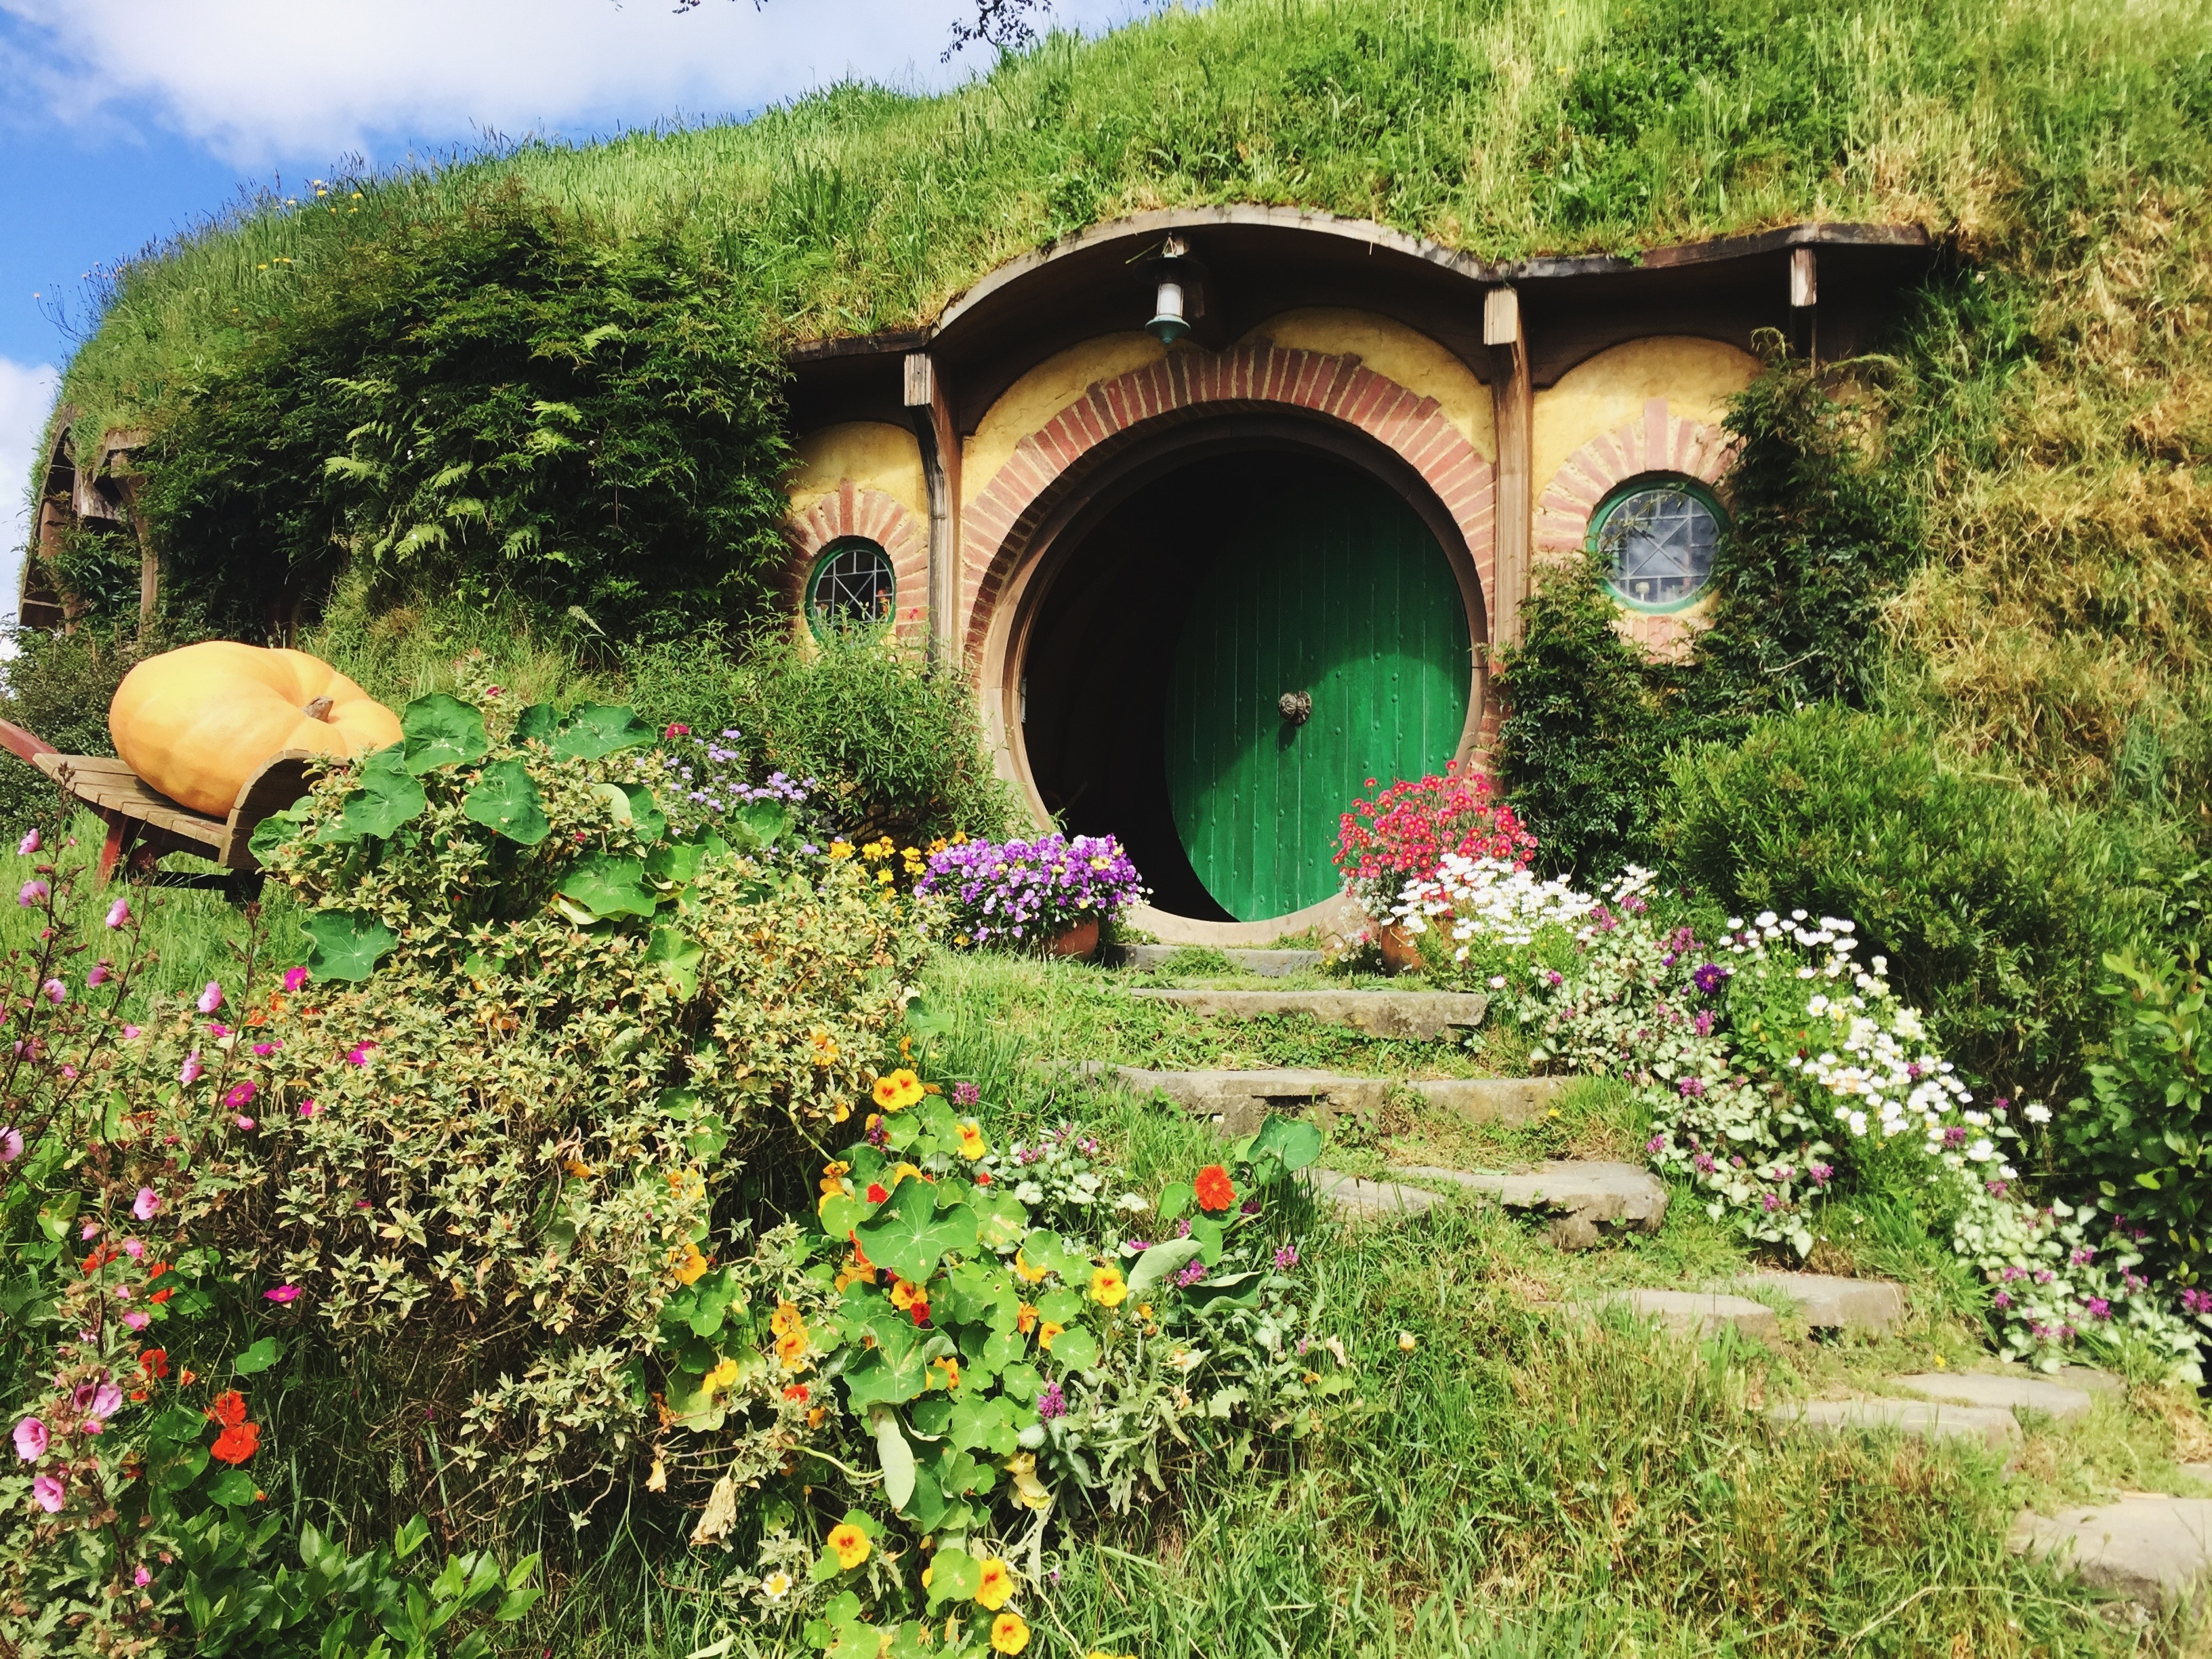 Hobbiton - Bag End